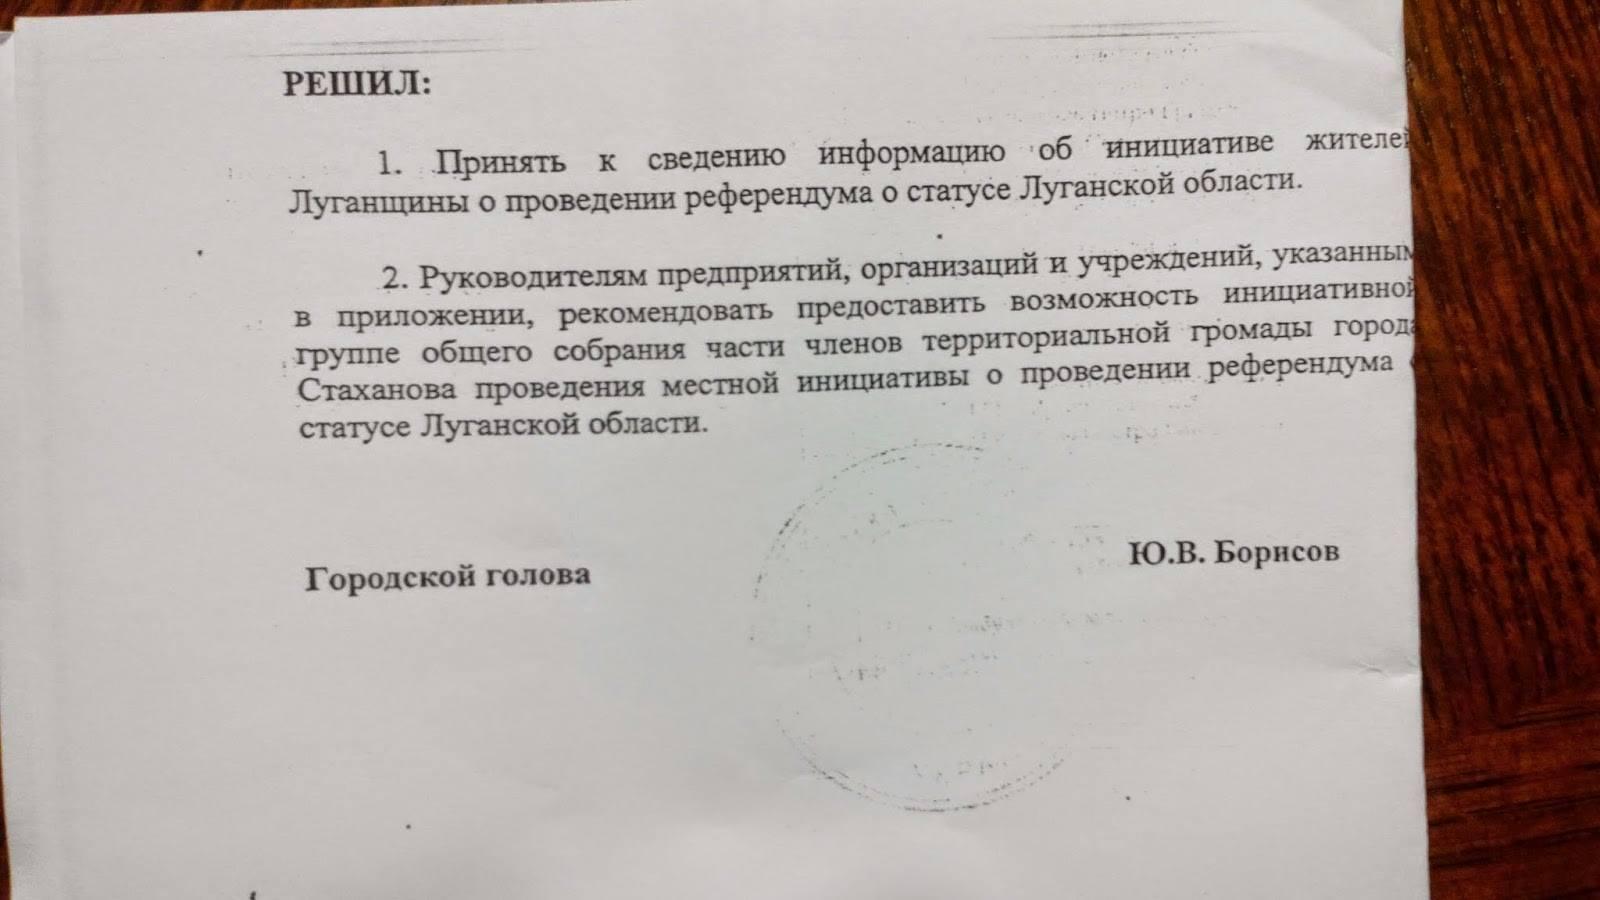 Суд оправдал экс-мэра Стаханова, проводившего «референдум»